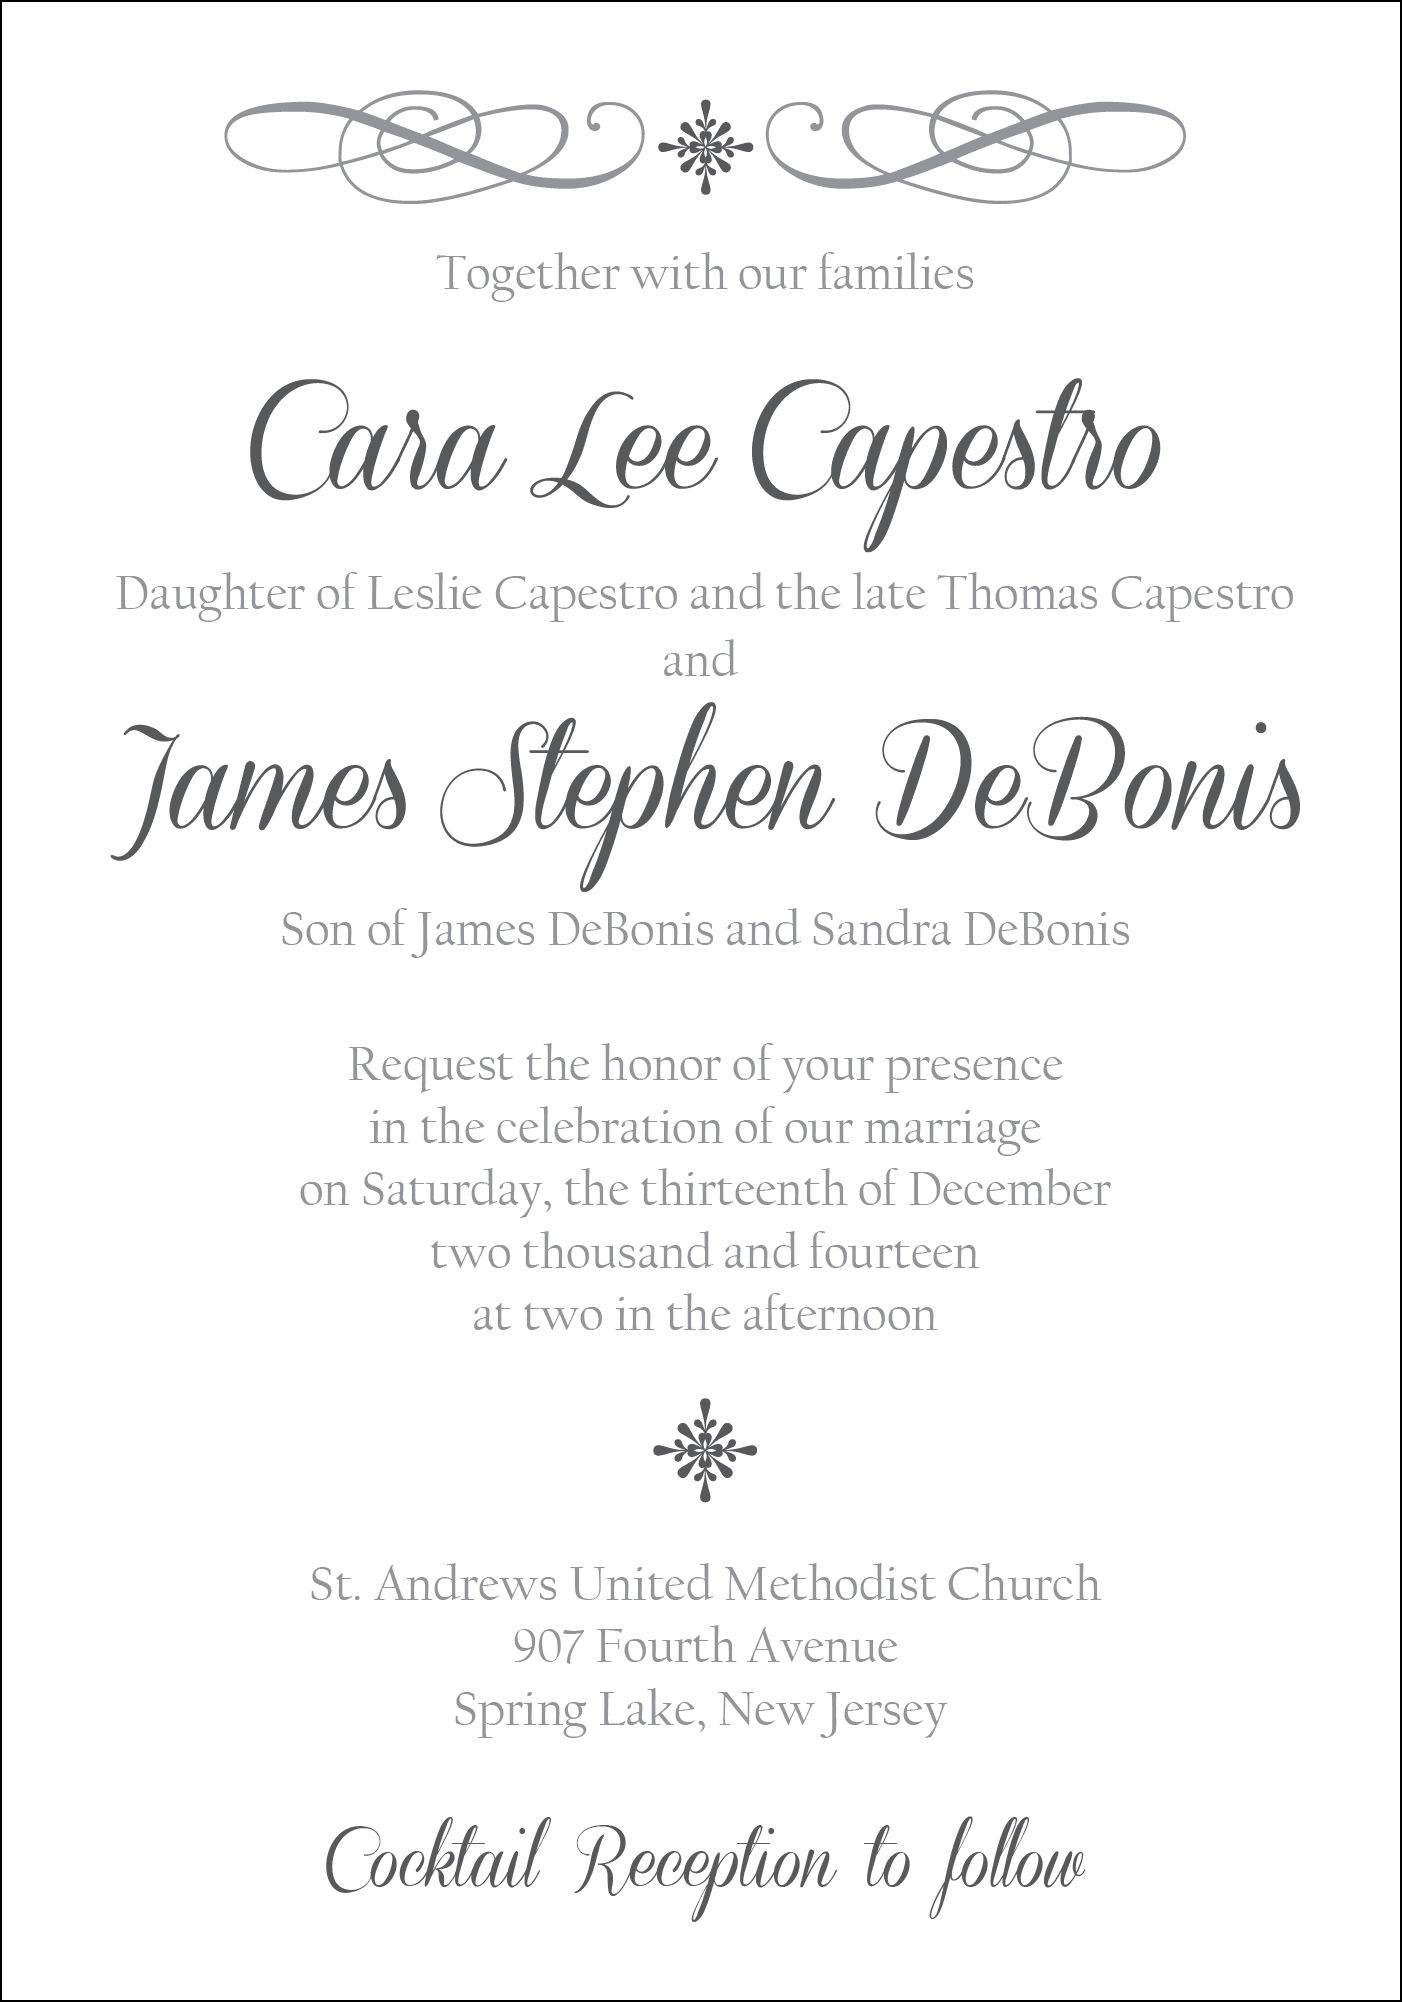 Wedding Invitation Design | Personal Invitation Designs | Pinterest ...